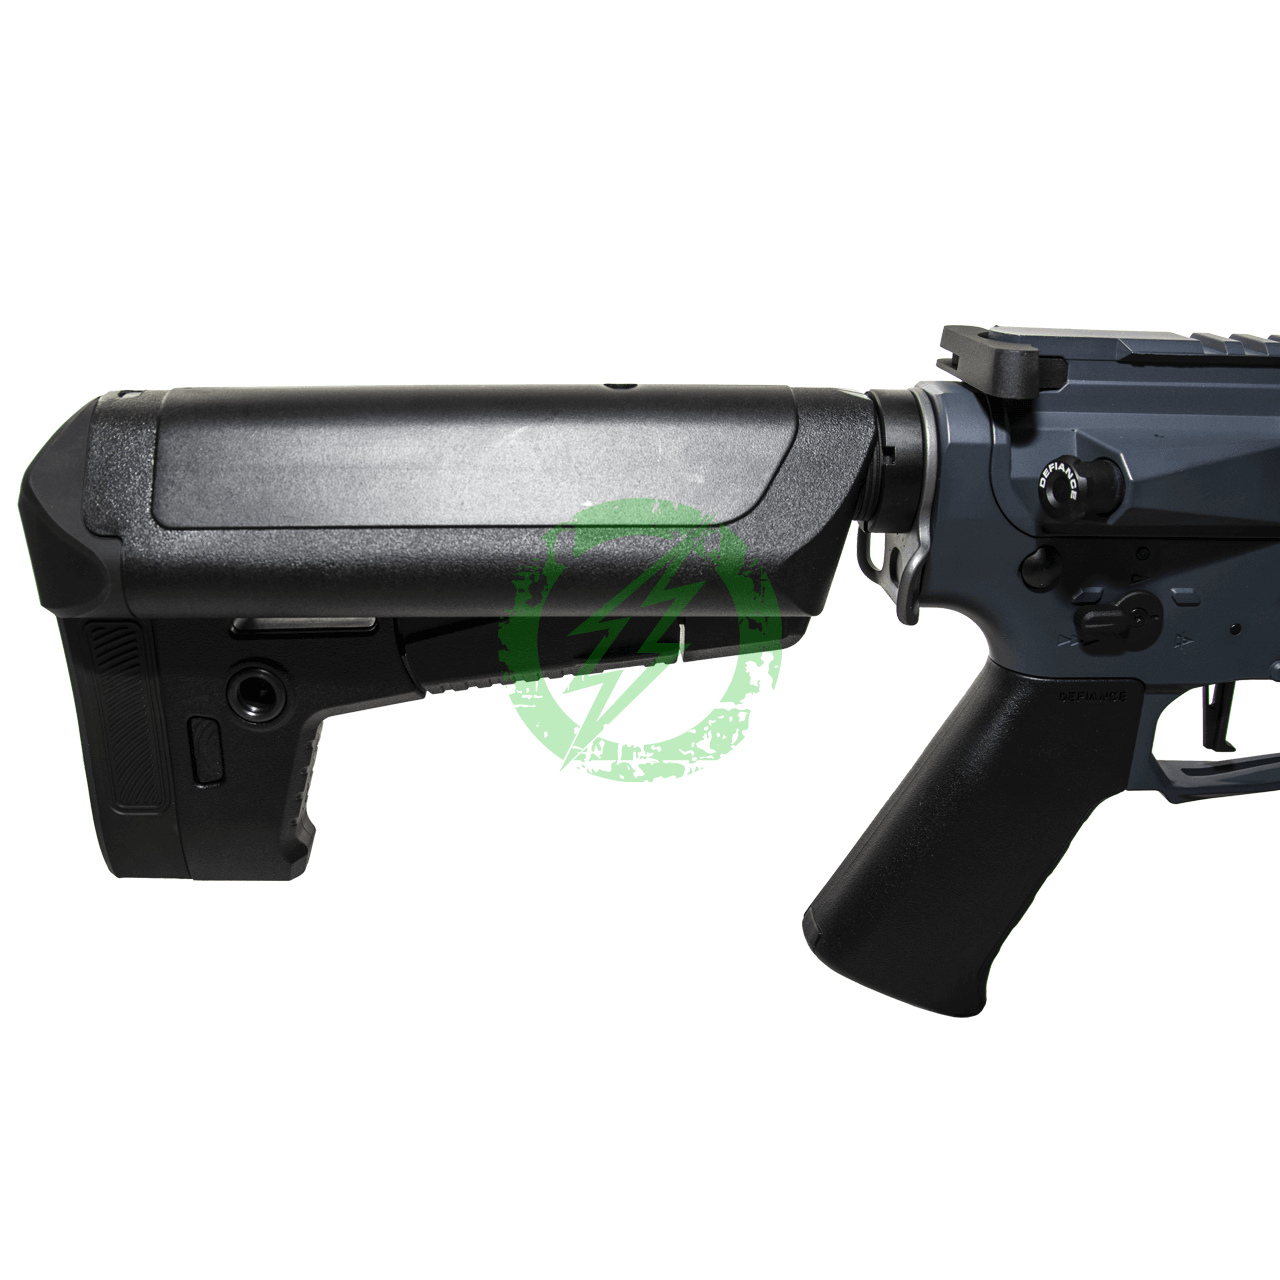 Krytac Full Metal Trident MKII-M SPR Rifle   Combat Grey   MLOK Stock